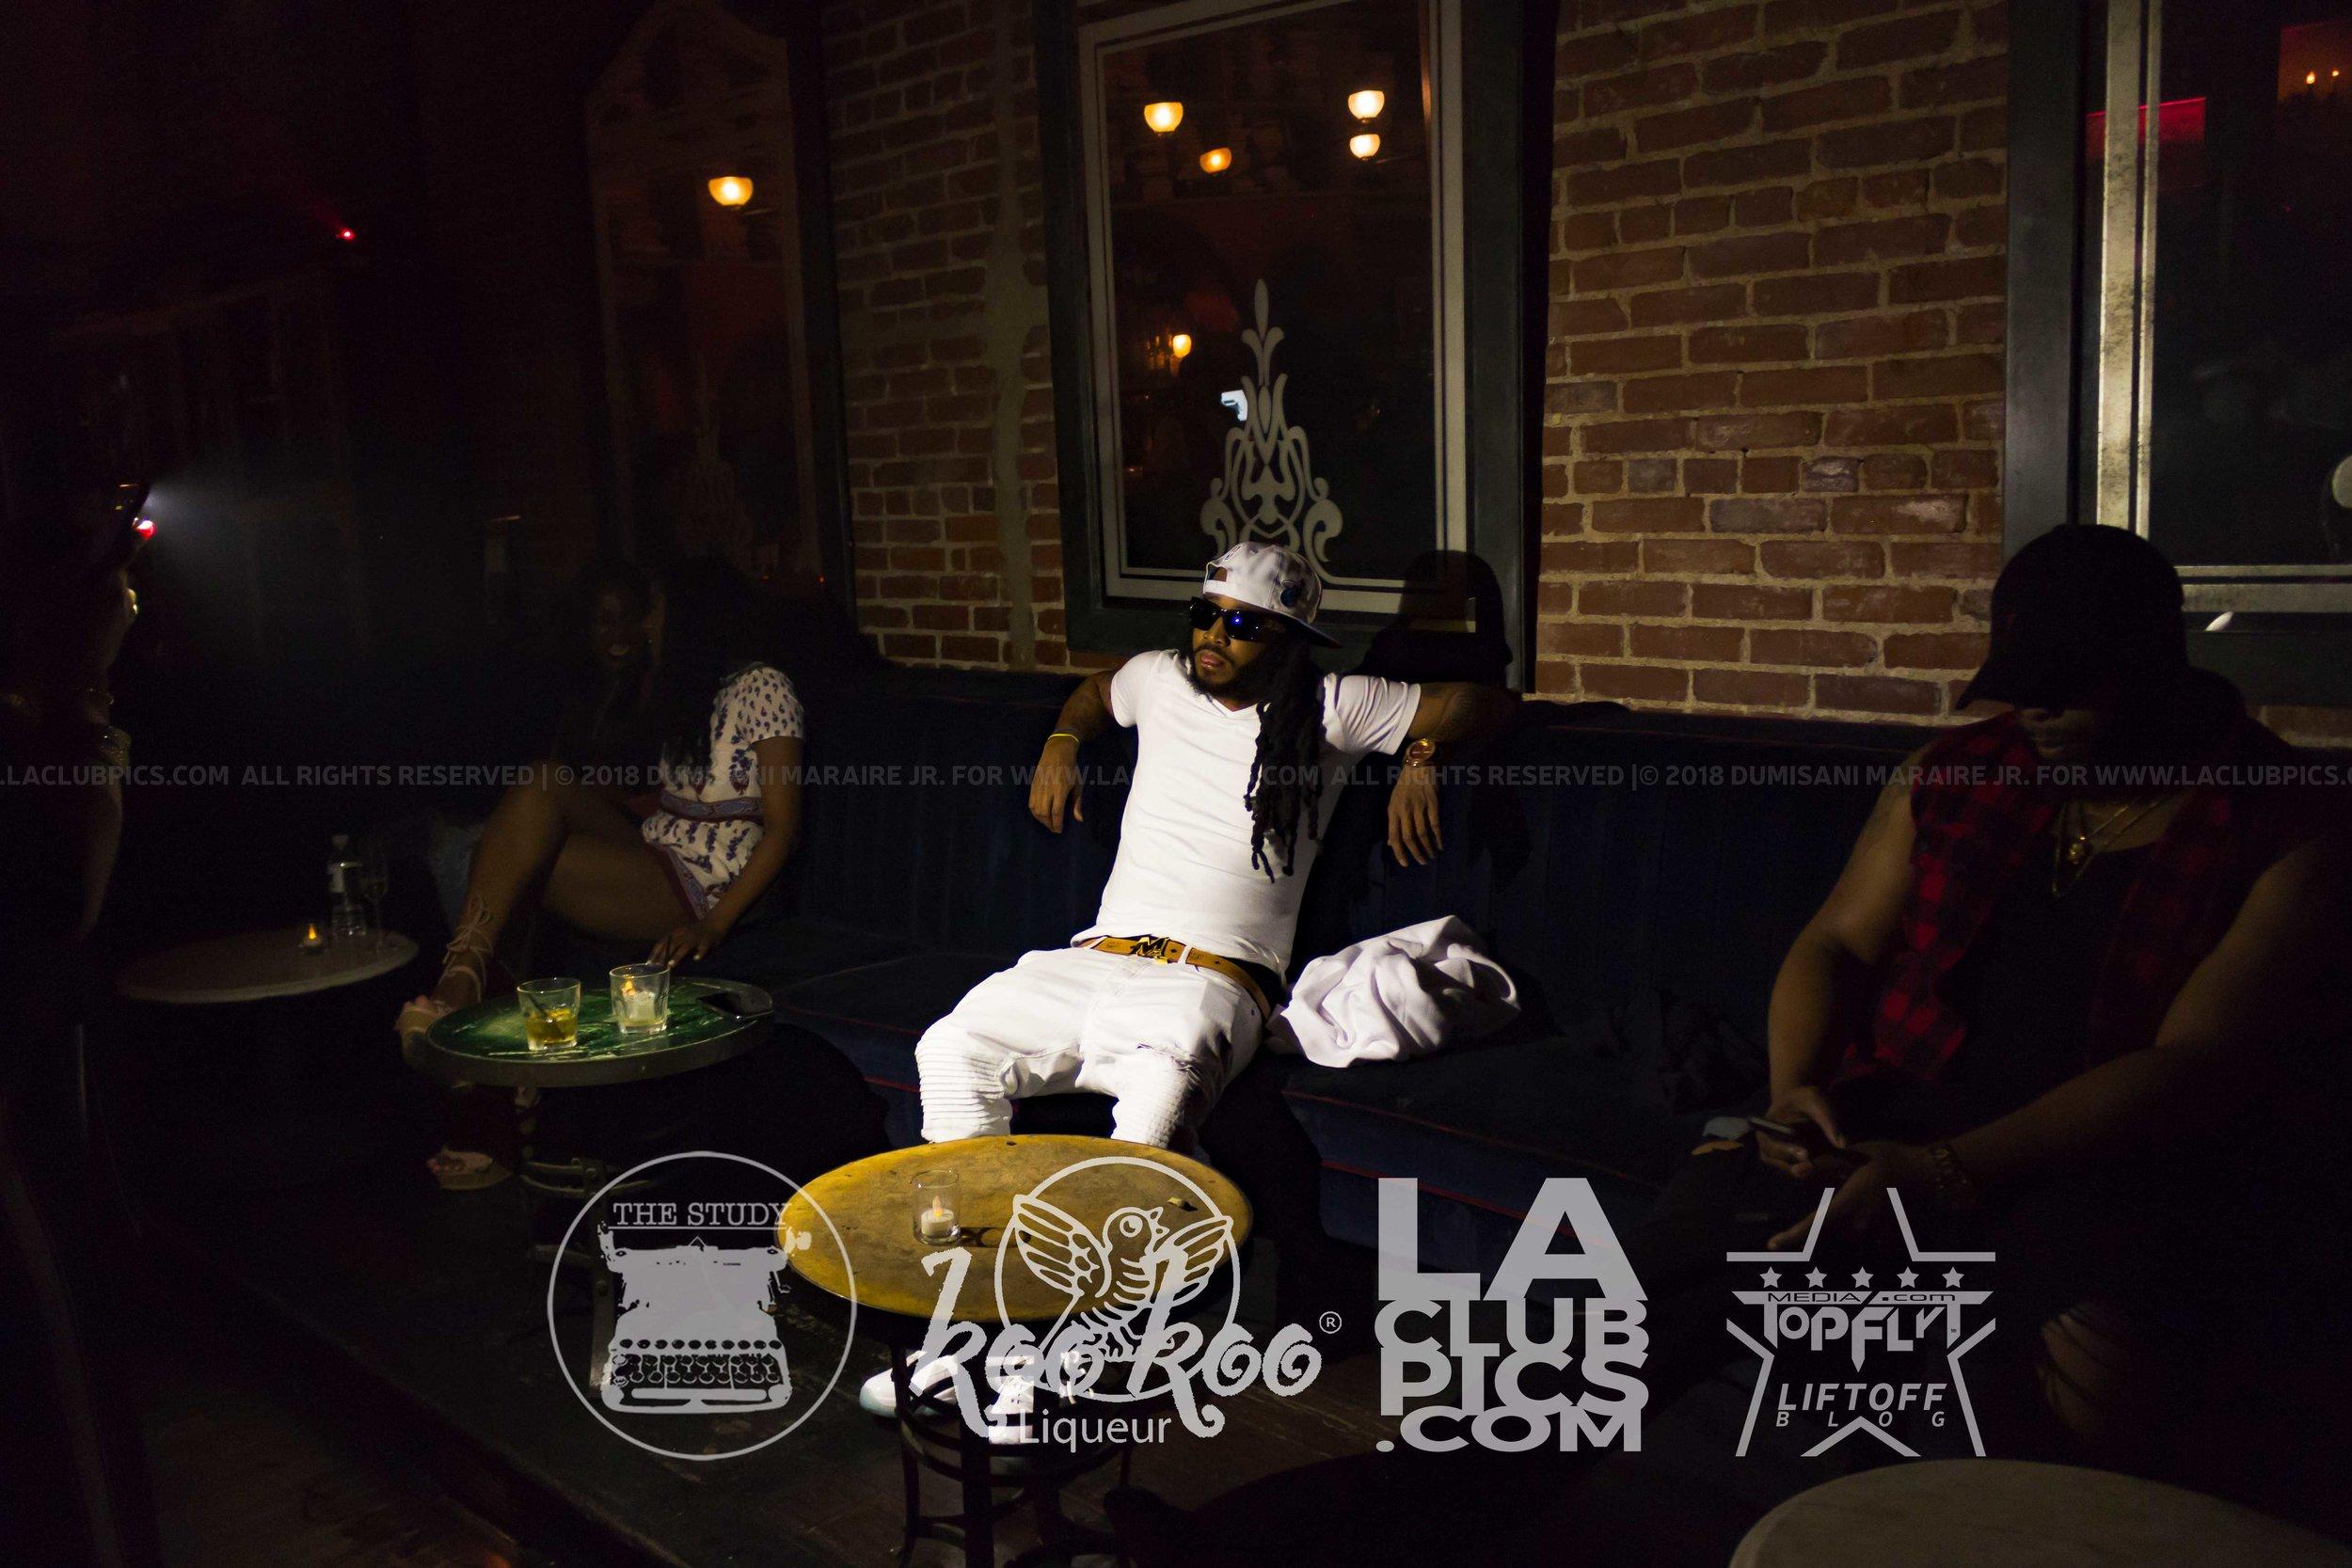 LA-Club-Pics-@-The-Study-Fixed.jpg